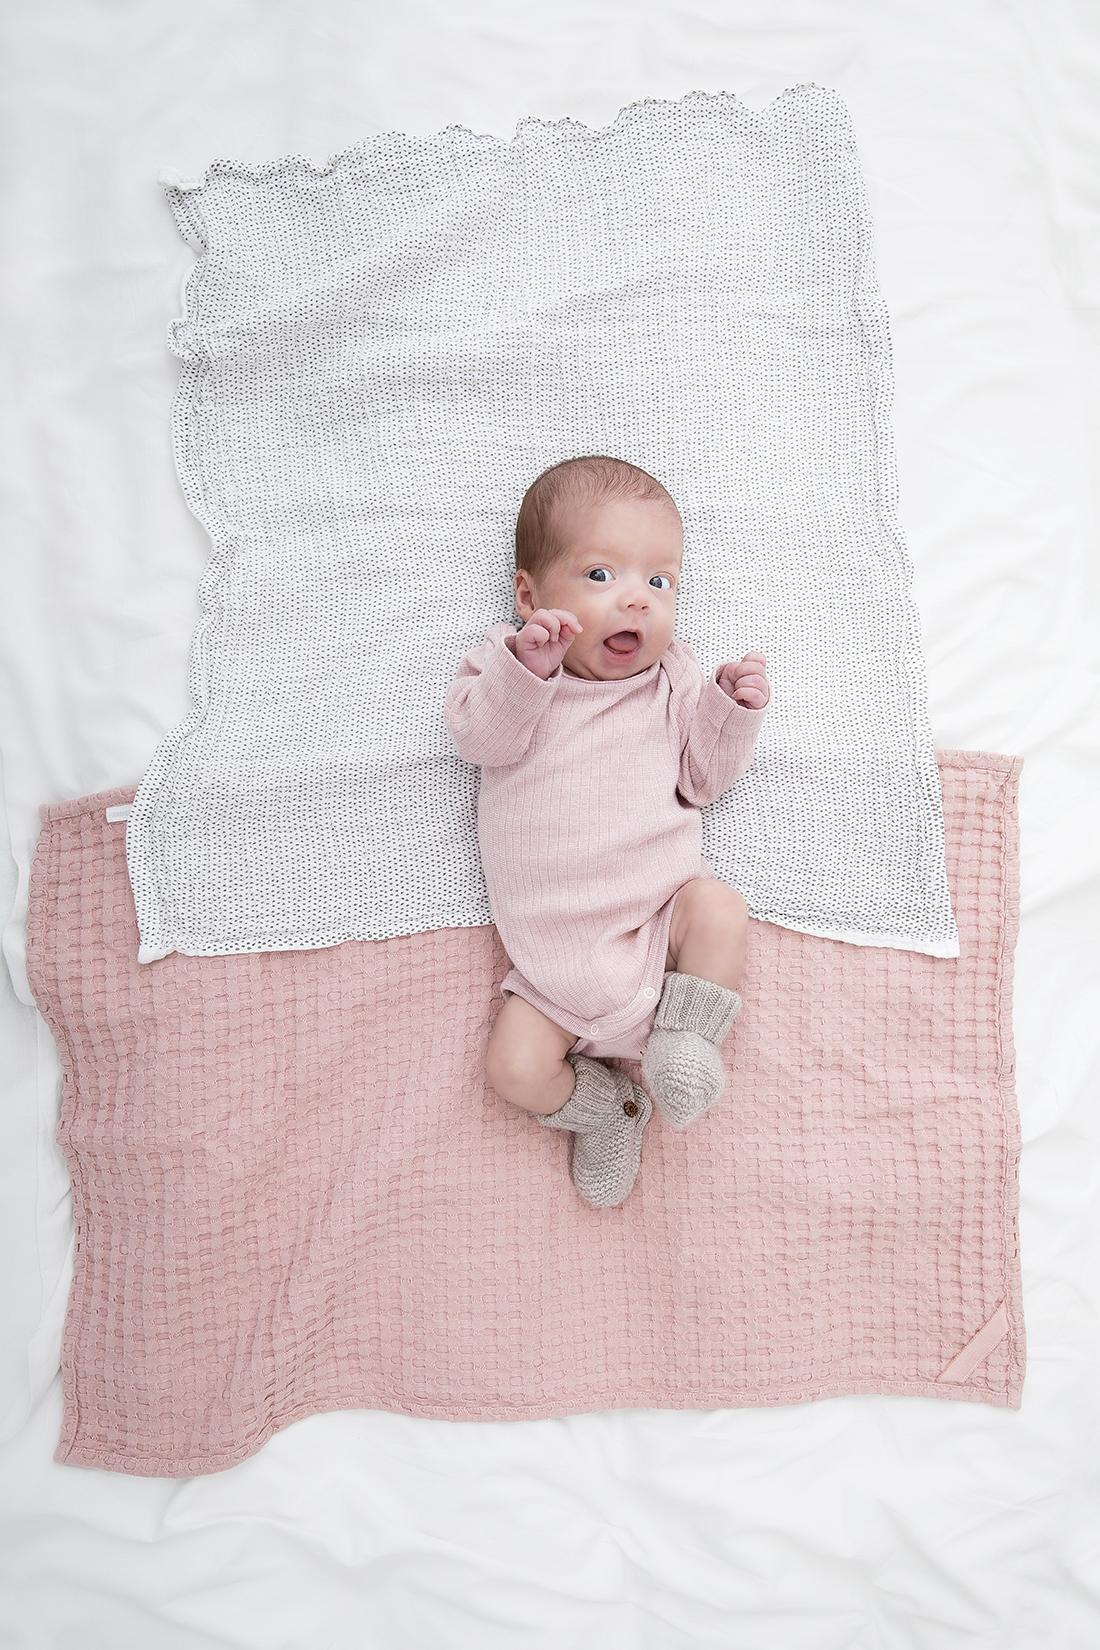 Babyfotografie_Neugeborenenportrait © Little Monkey Fotografie, Berlin 2018_IMG_1578_140